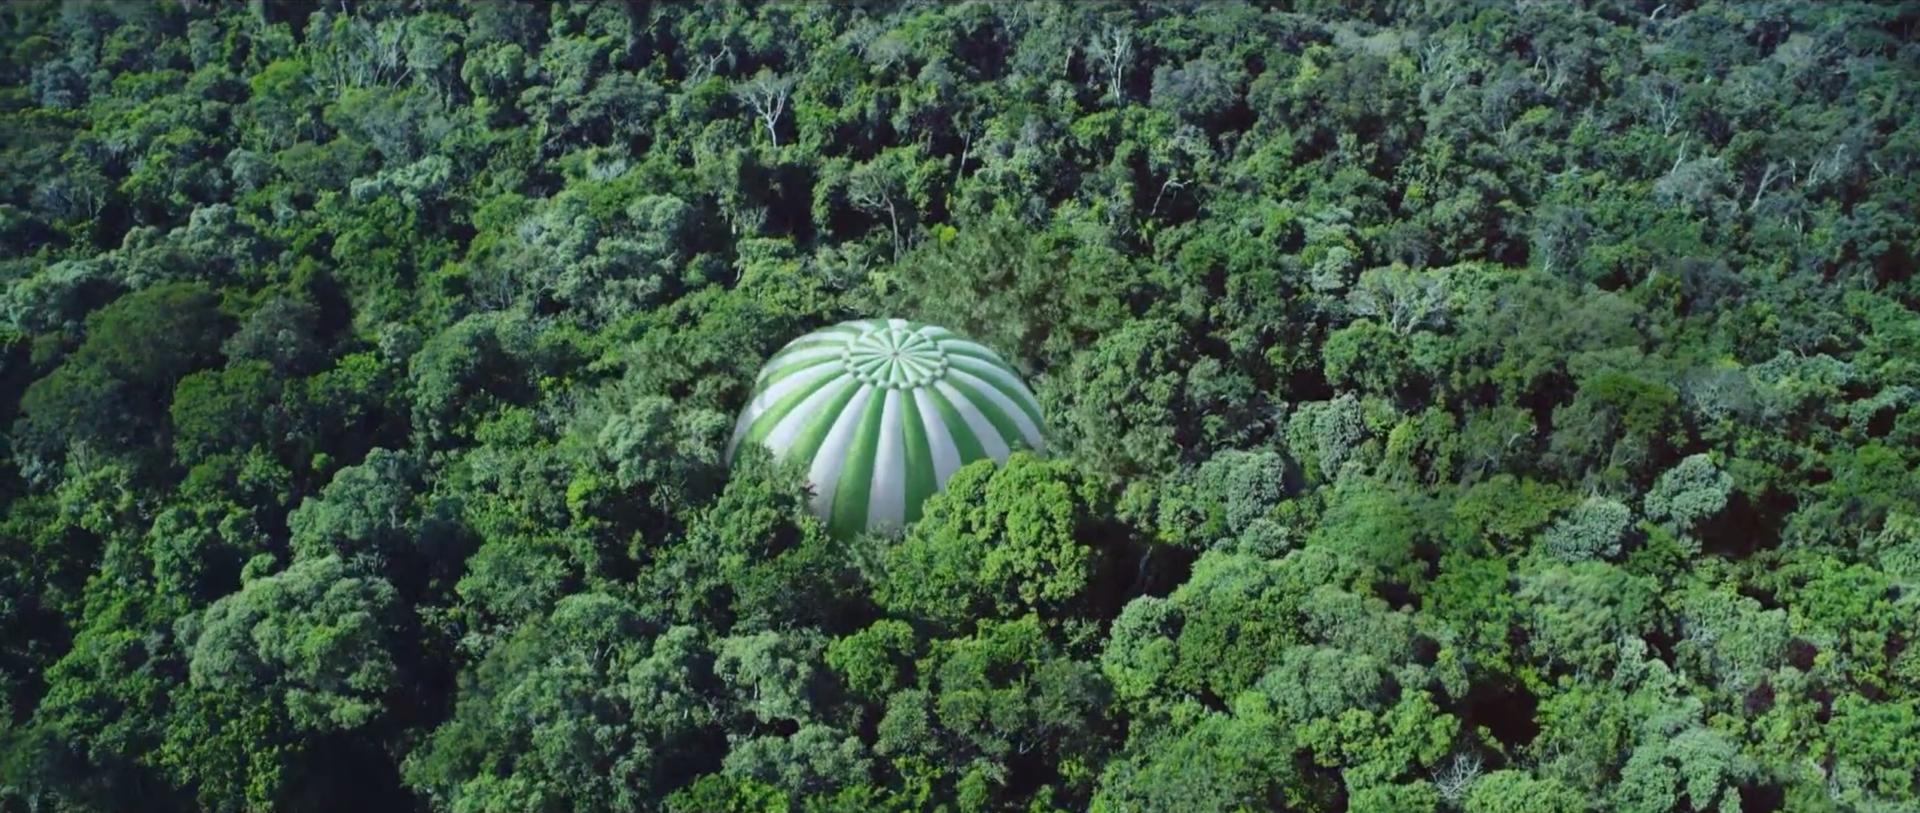 PERRIER_Hot_Air_Balloons